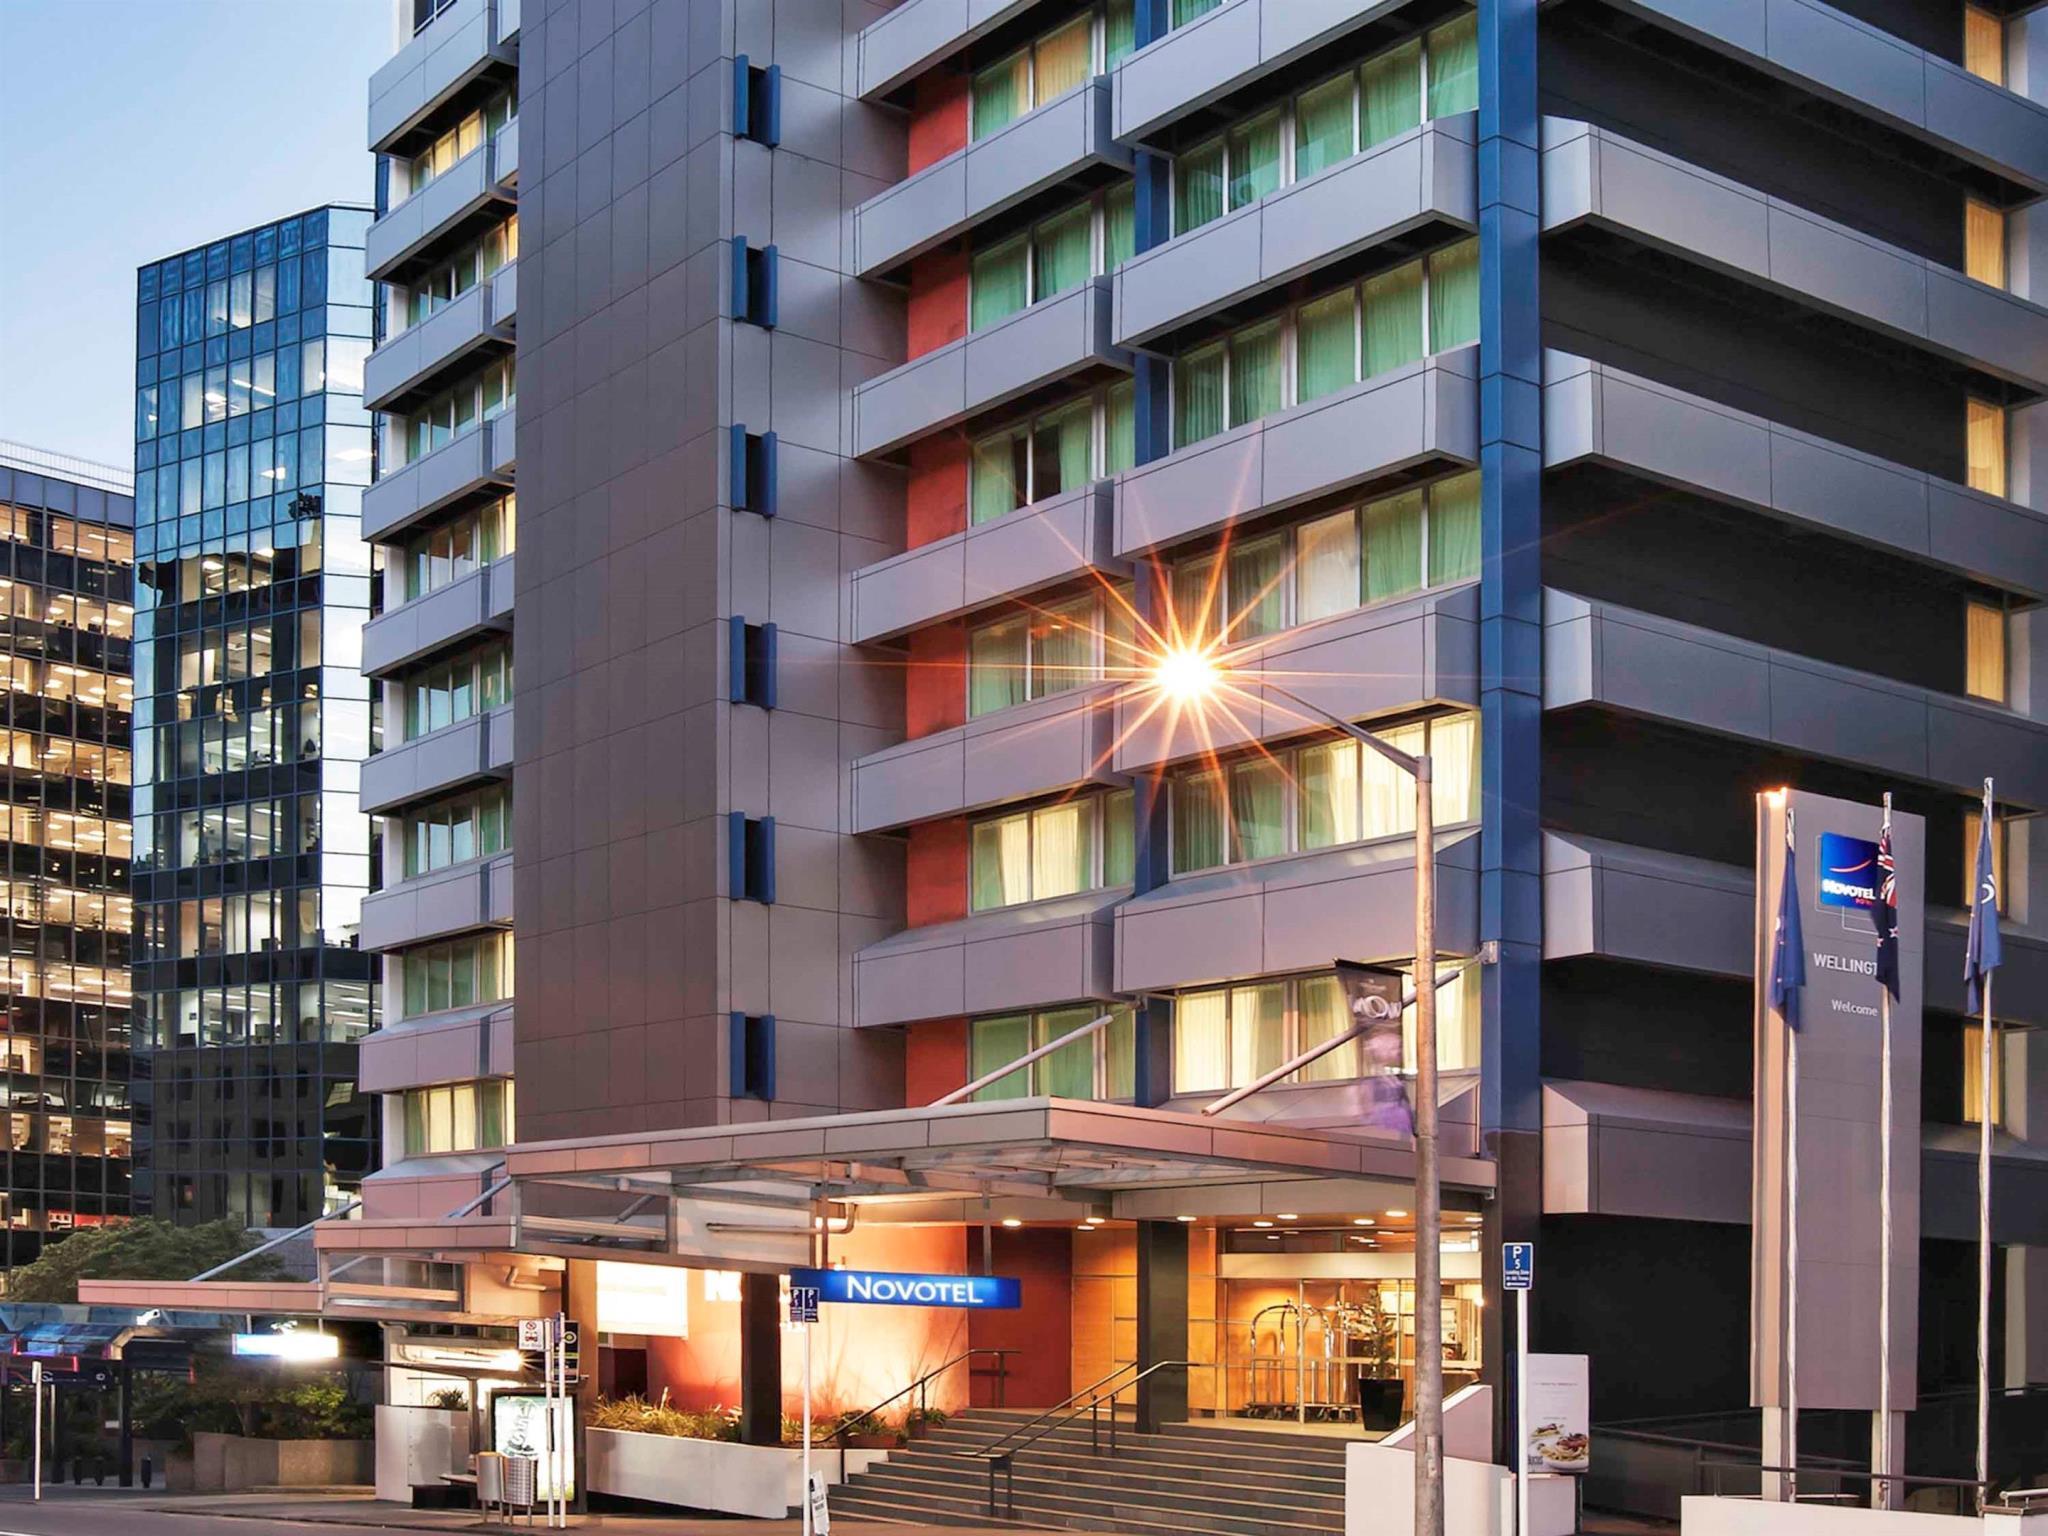 Novotel Wellington Hotel